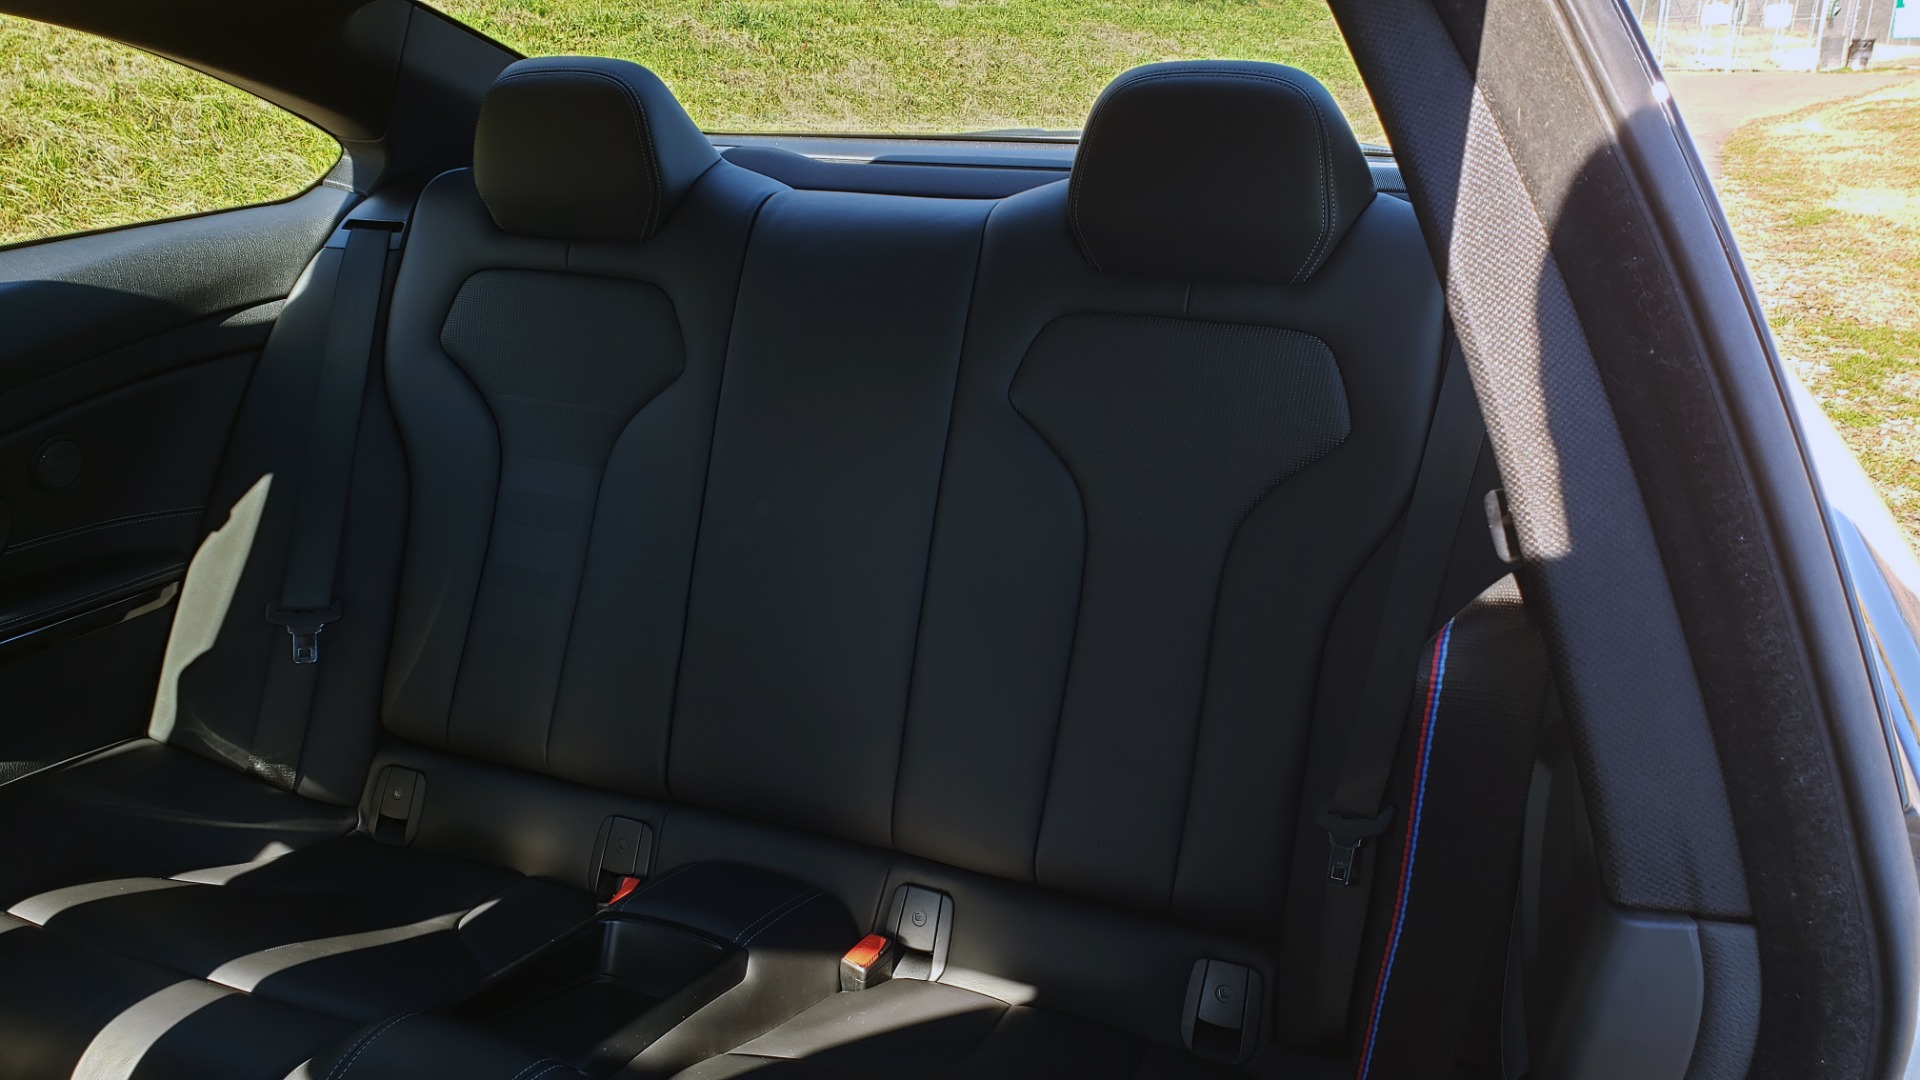 Used 2018 BMW M4 COMP PKG / EXEC / M-DRIVER / PARK CNTRL / ACTIVE BLIND SPOT for sale $45,449 at Formula Imports in Charlotte NC 28227 61